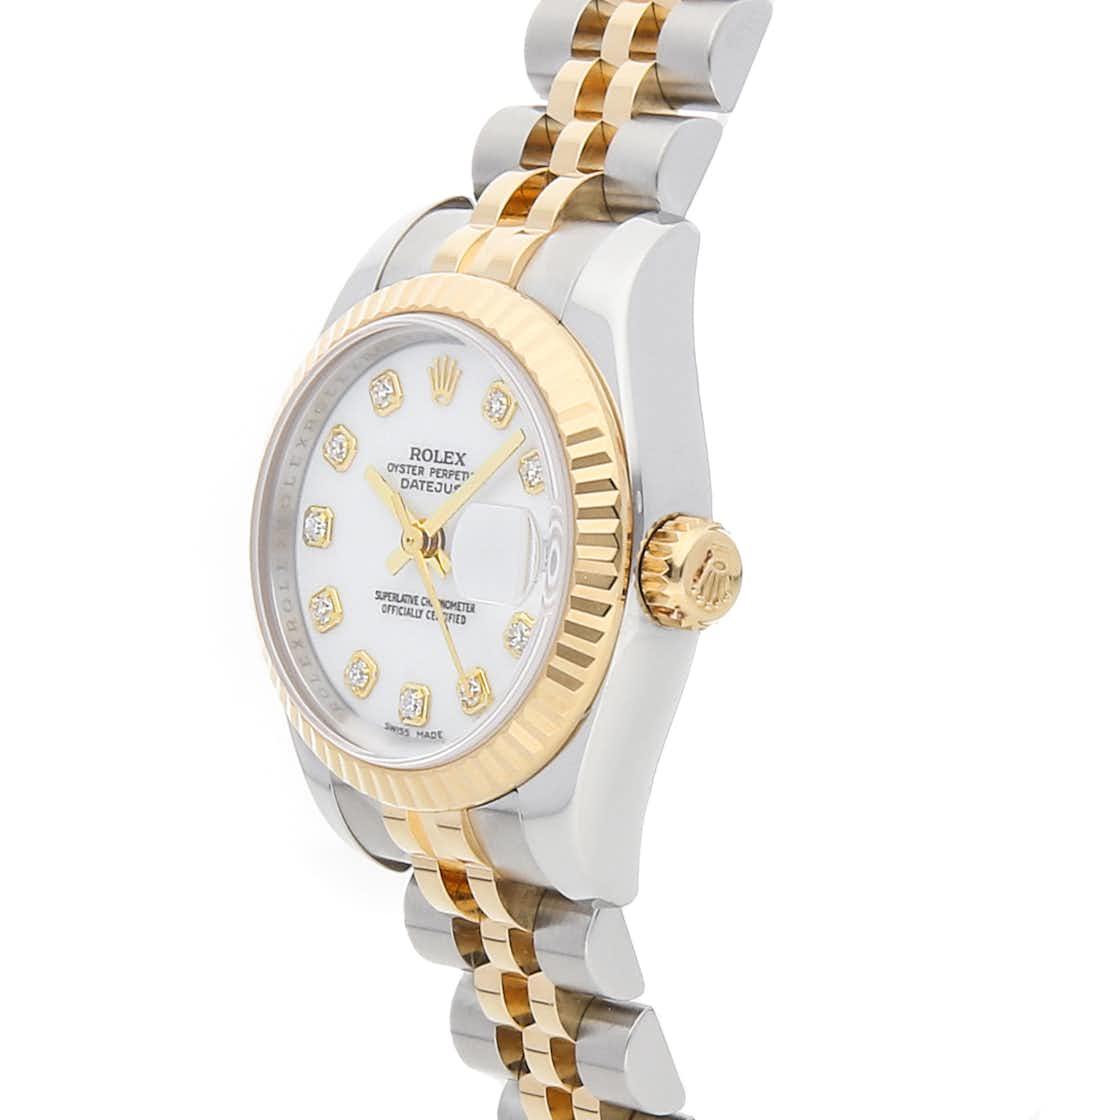 Rolex Datejust 179173